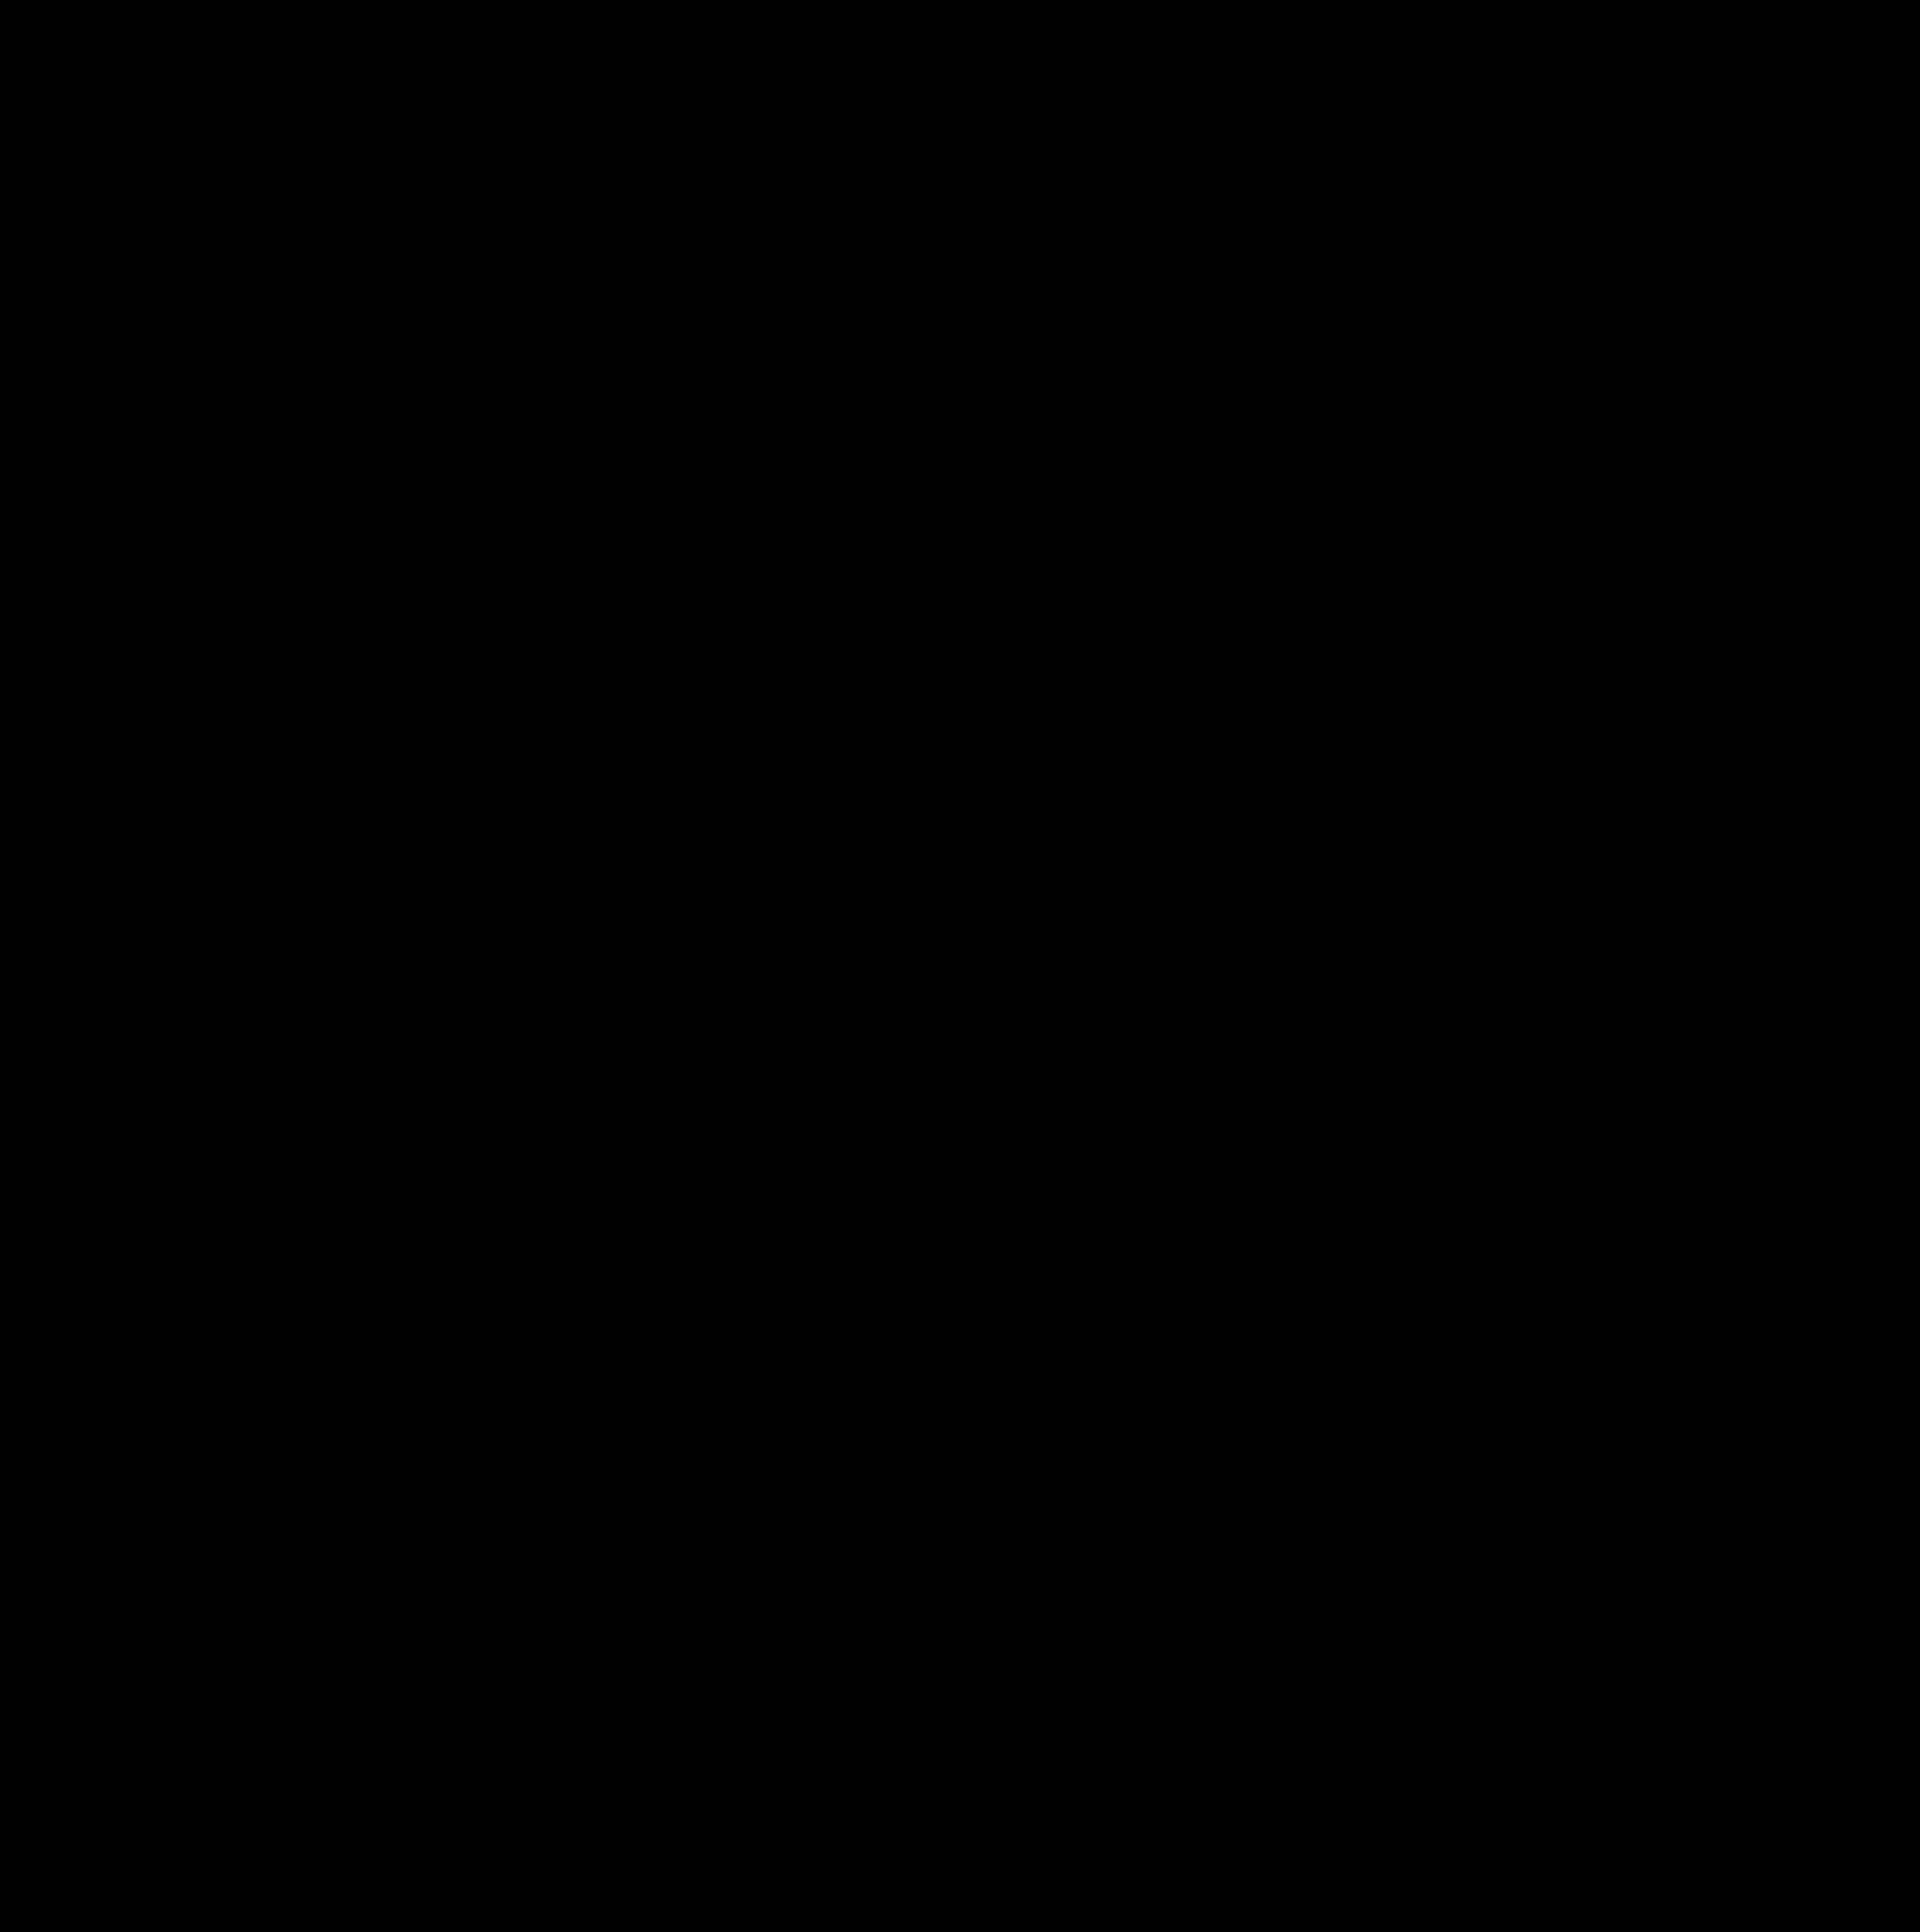 image download Baphomet drawing simple. File seal of bold